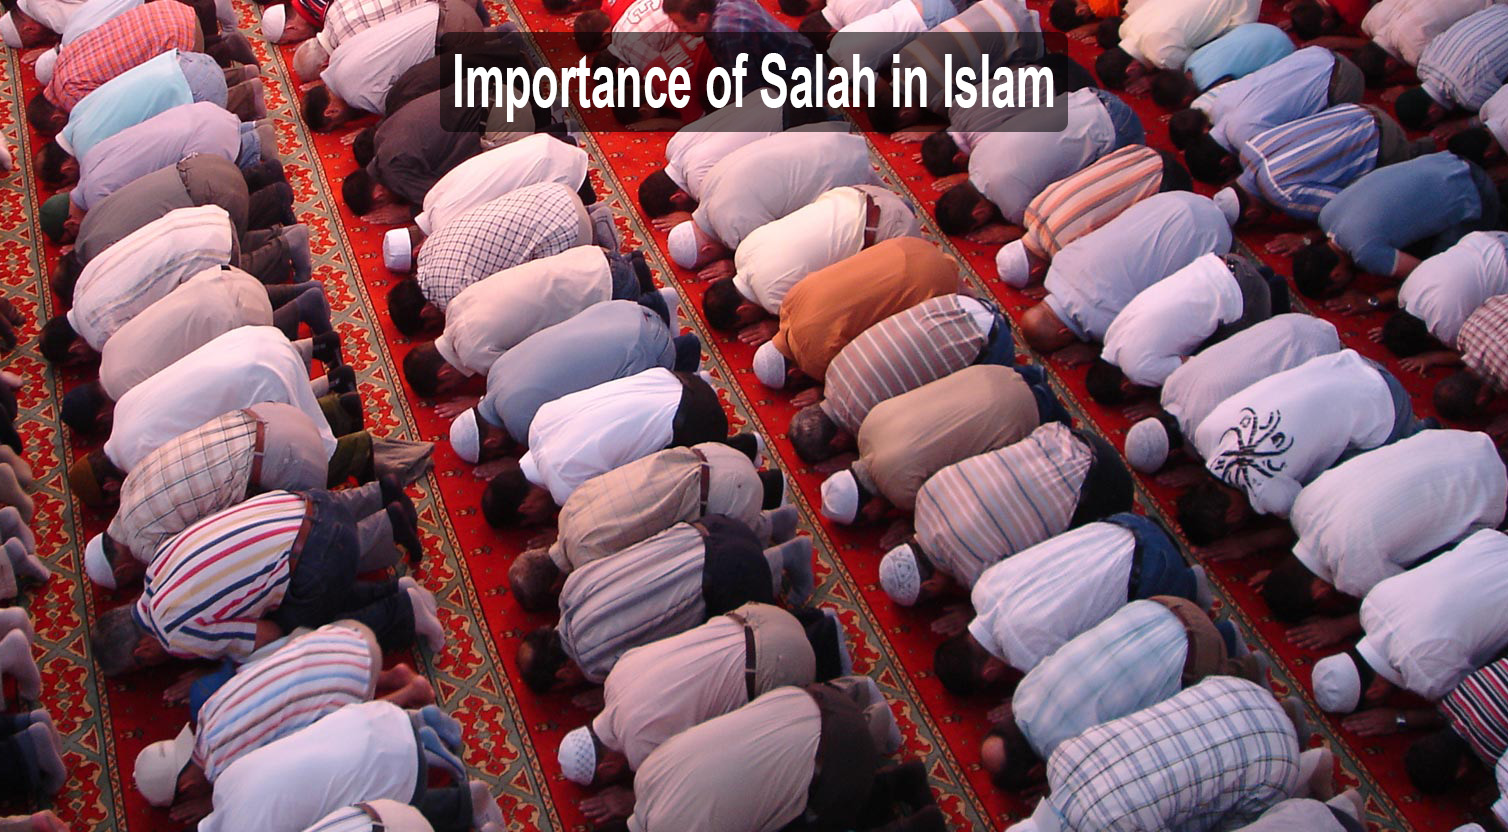 Importance of Salah in Islam